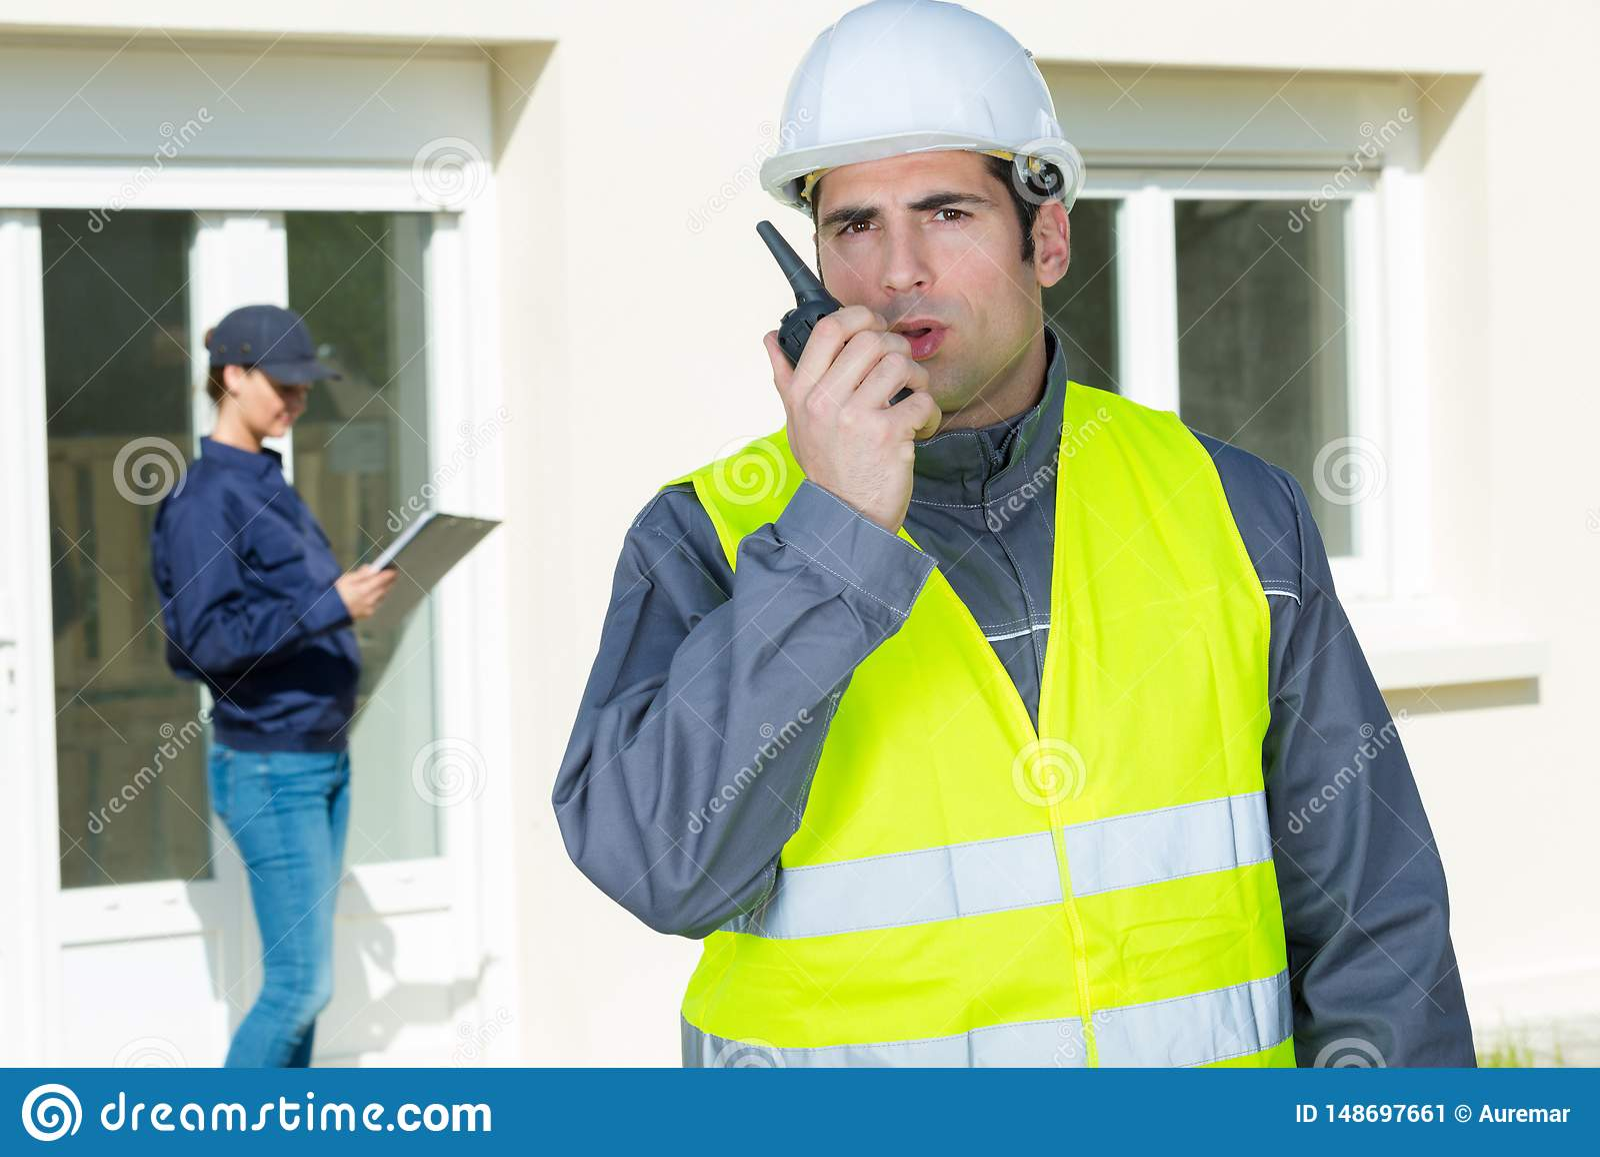 Building construction foreman giving order through walkietalkie